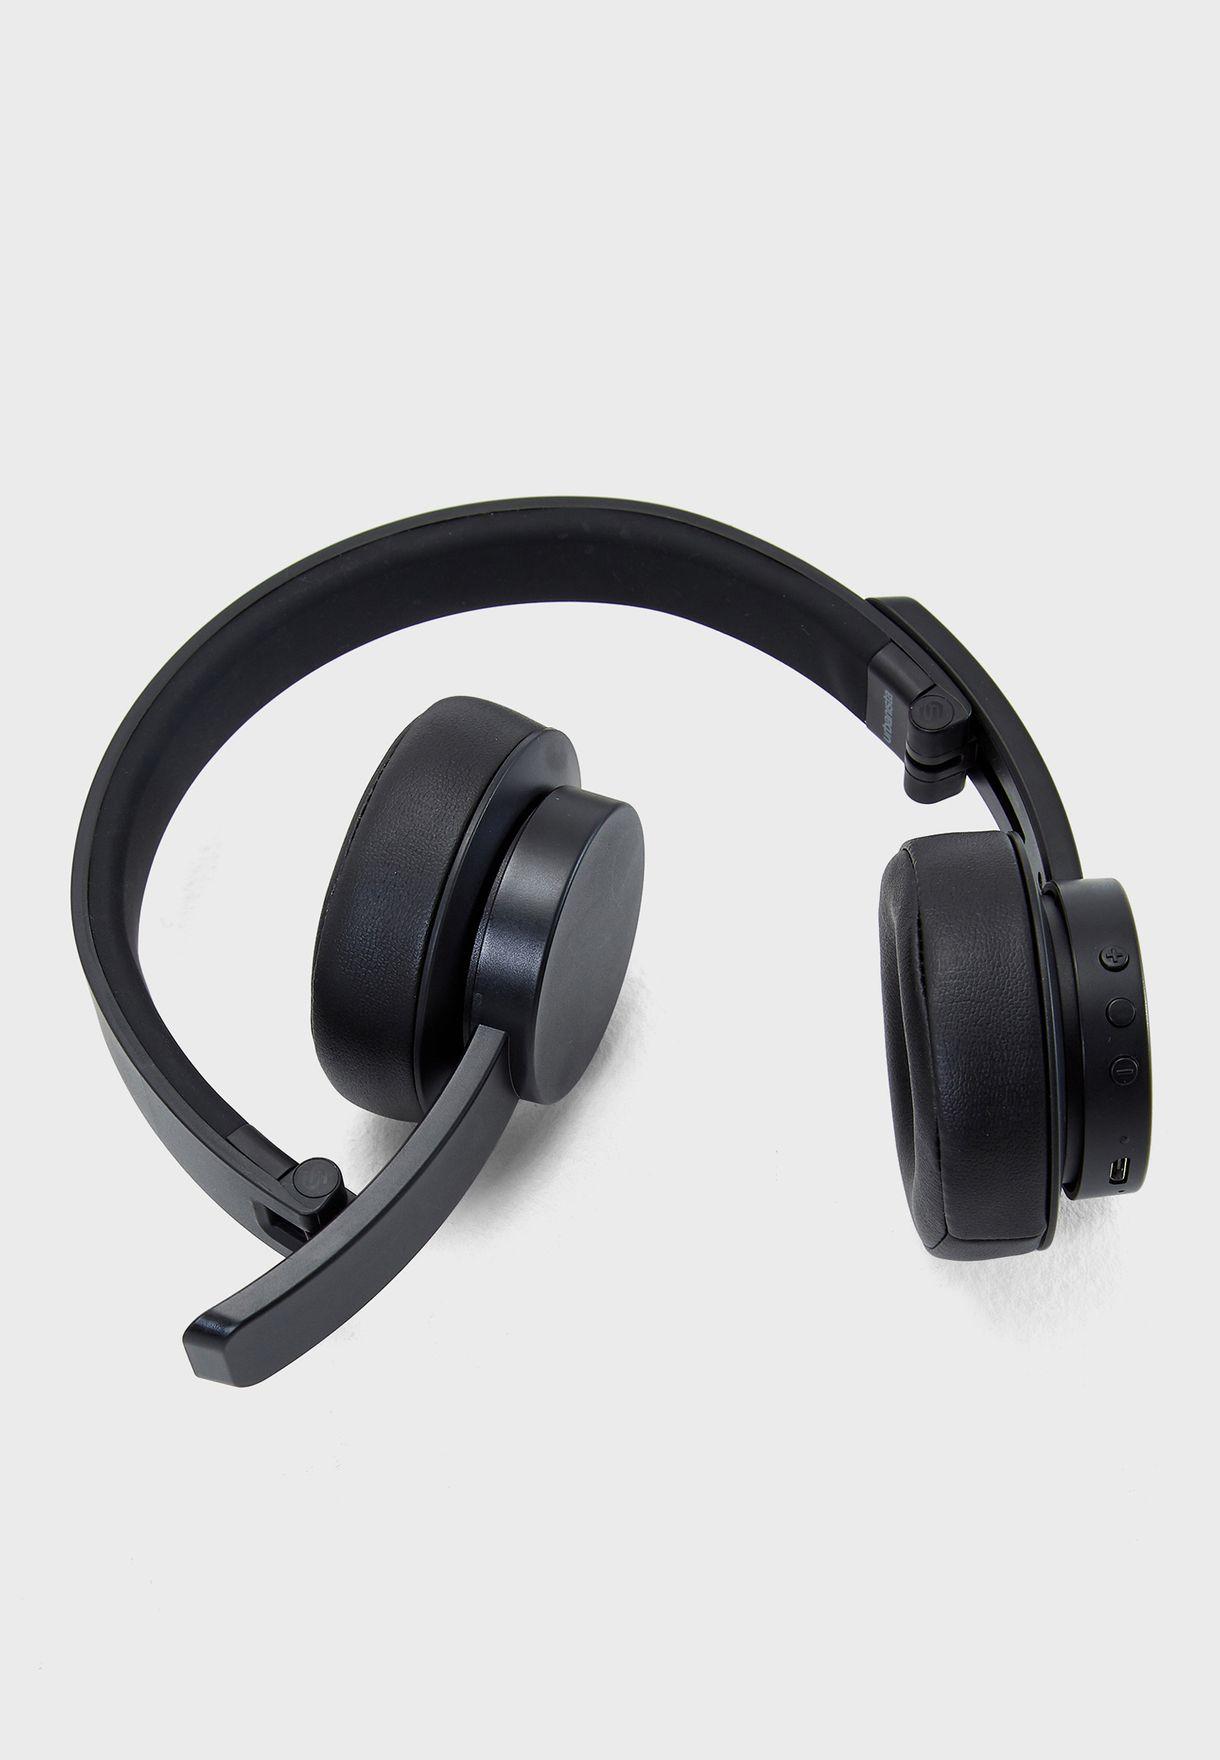 Detroit Wireless Headphones